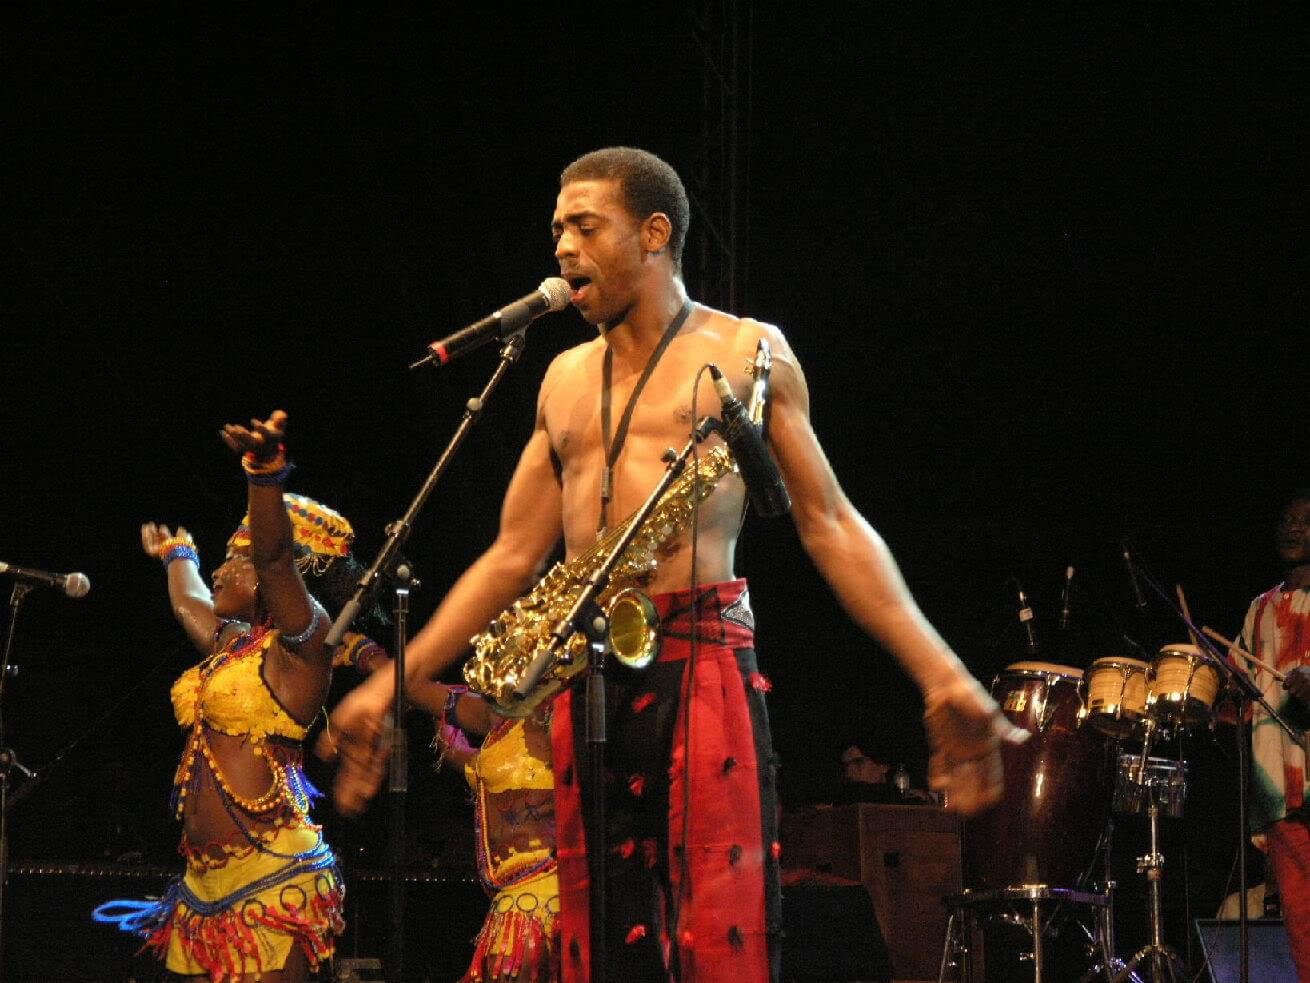 Femi Kuti Afrobeat vs Afrobeats